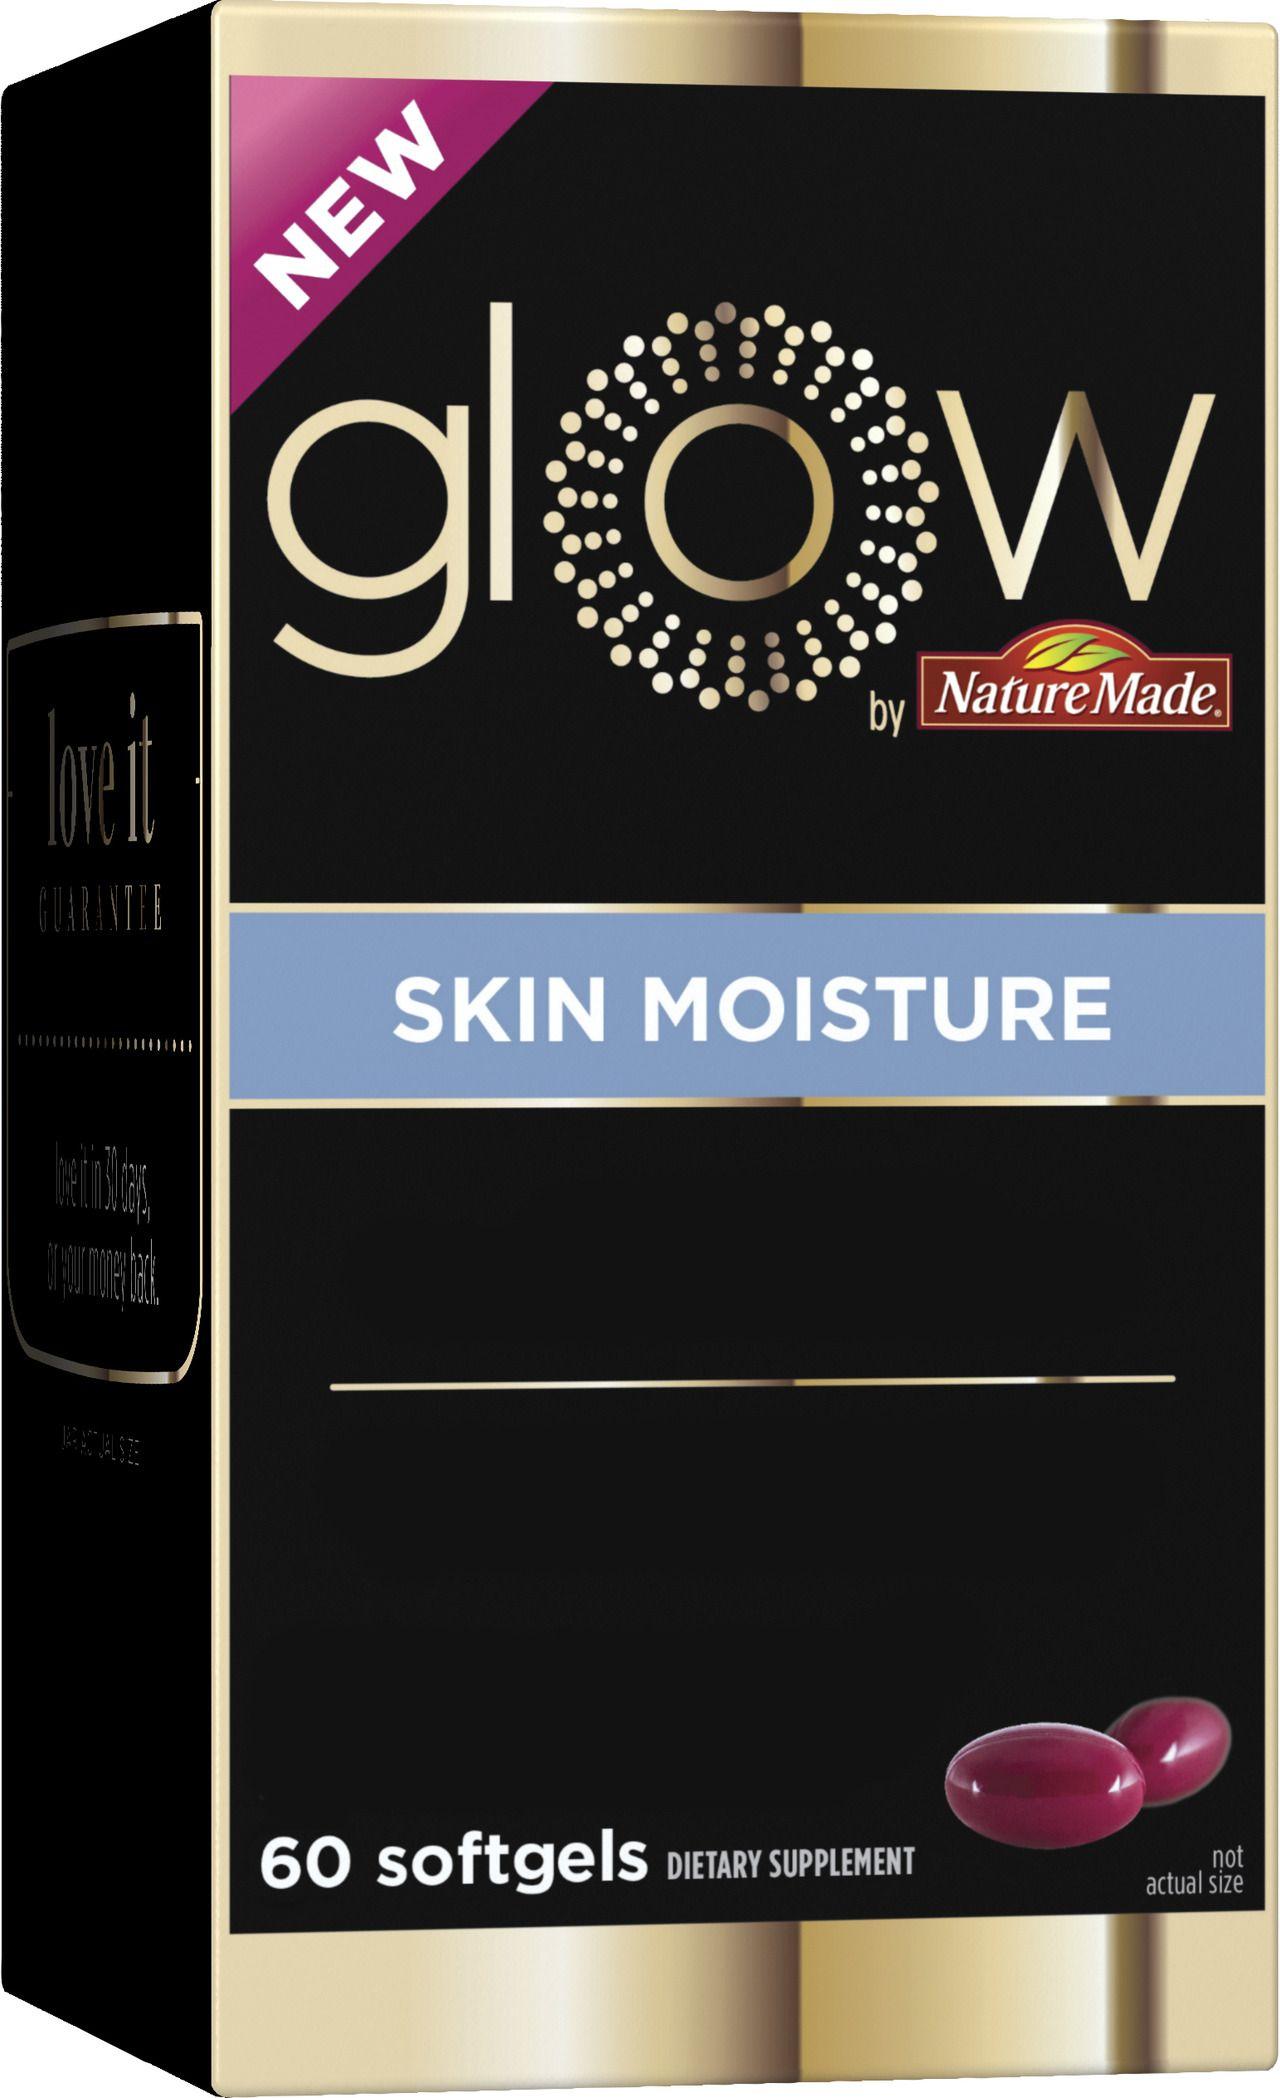 How Do You Take Care Of Your Skin Skin Moisturizer Moisturizer Clear Skin Tips